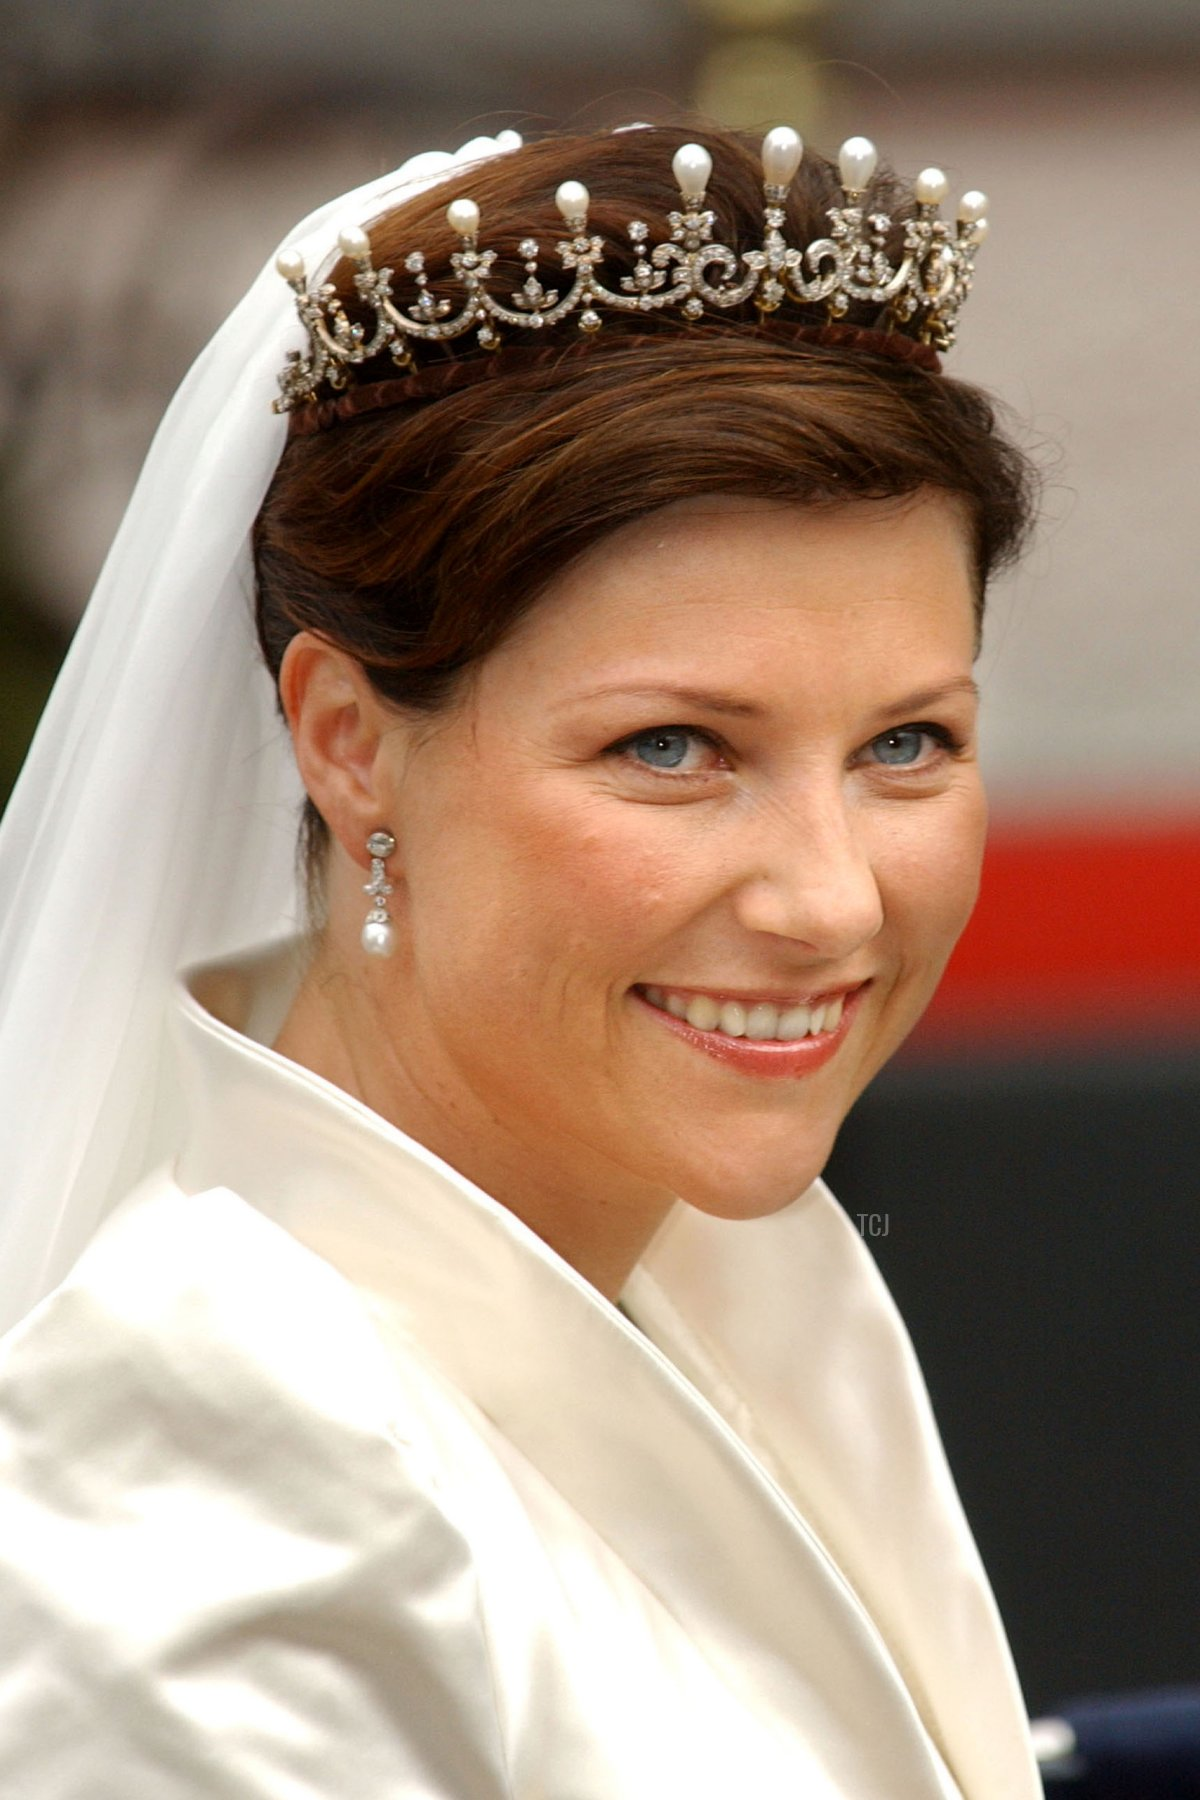 Norwegian Princess Martha Louise leaves the Royal Residence for her wedding to writer Ari Behn May 24, 2002 in Trondheim, Norway